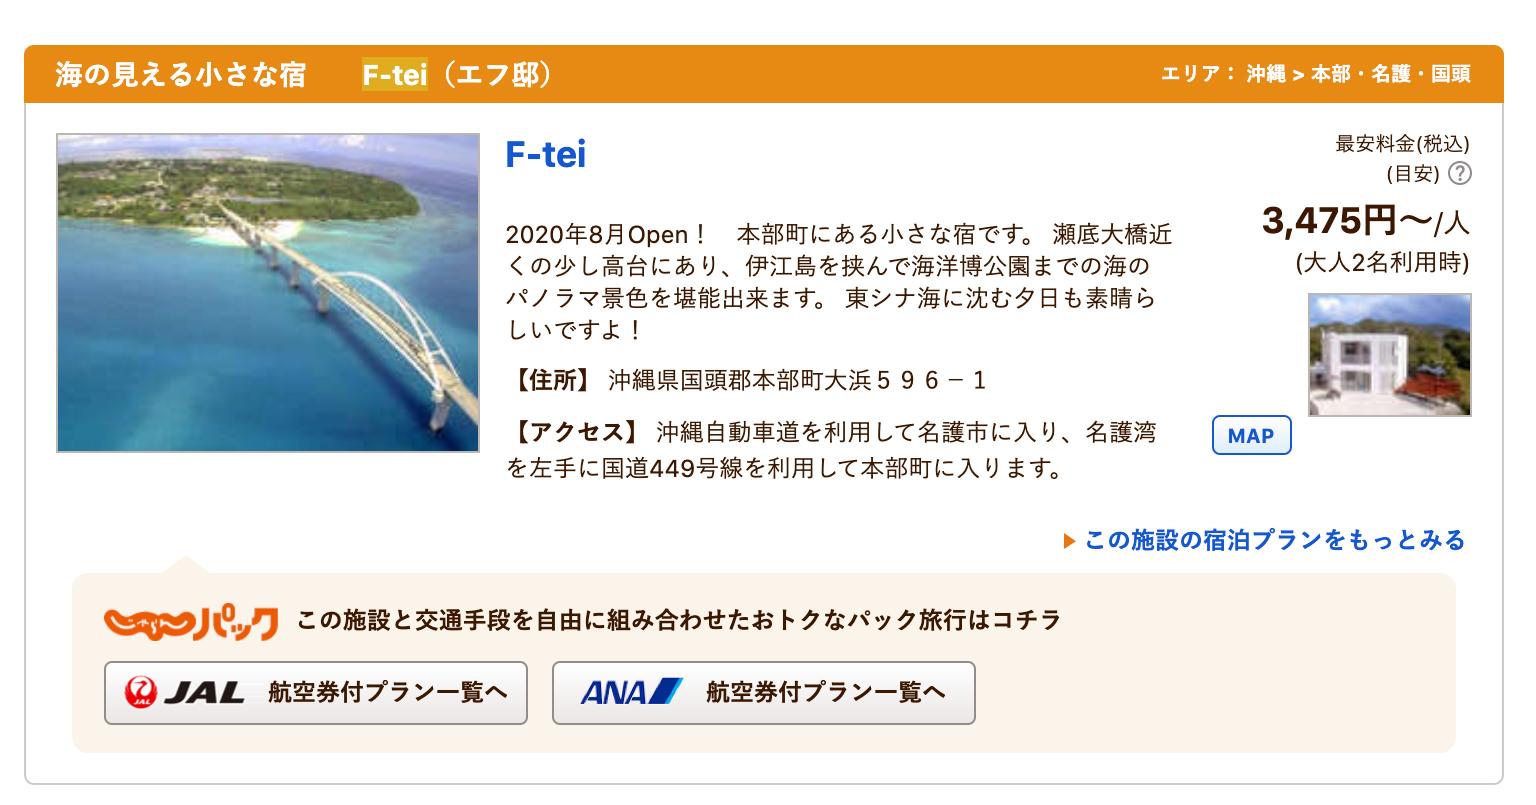 JAL、ANA 航空券付プラン